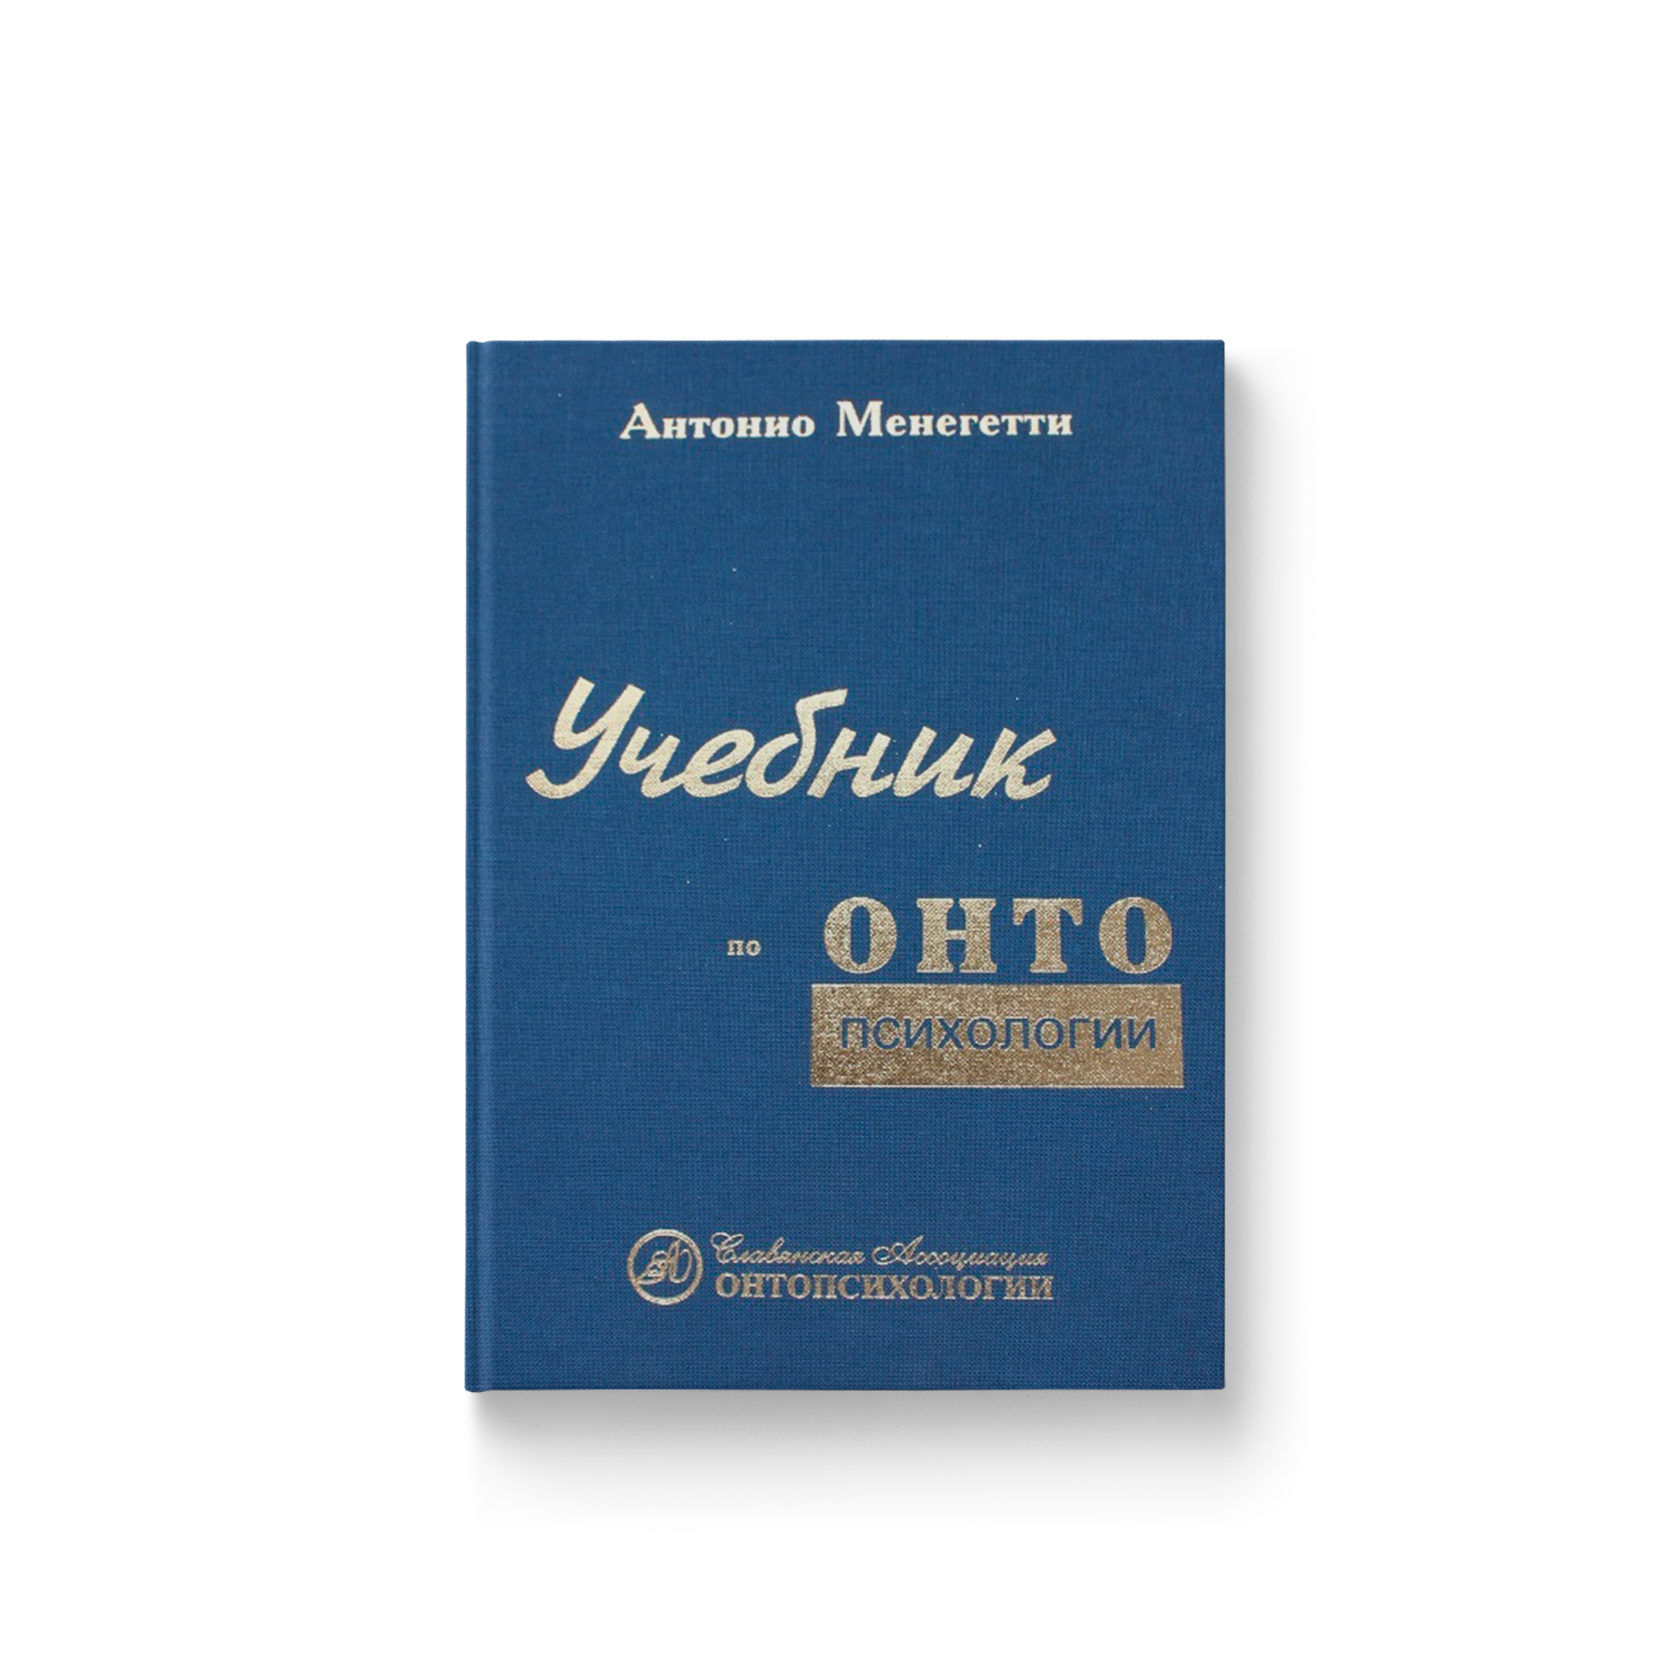 "<div style=""font-size:28px;color:#575965;"" data-customstyle=""yes"">Учебник по онтопсихологии</div>"